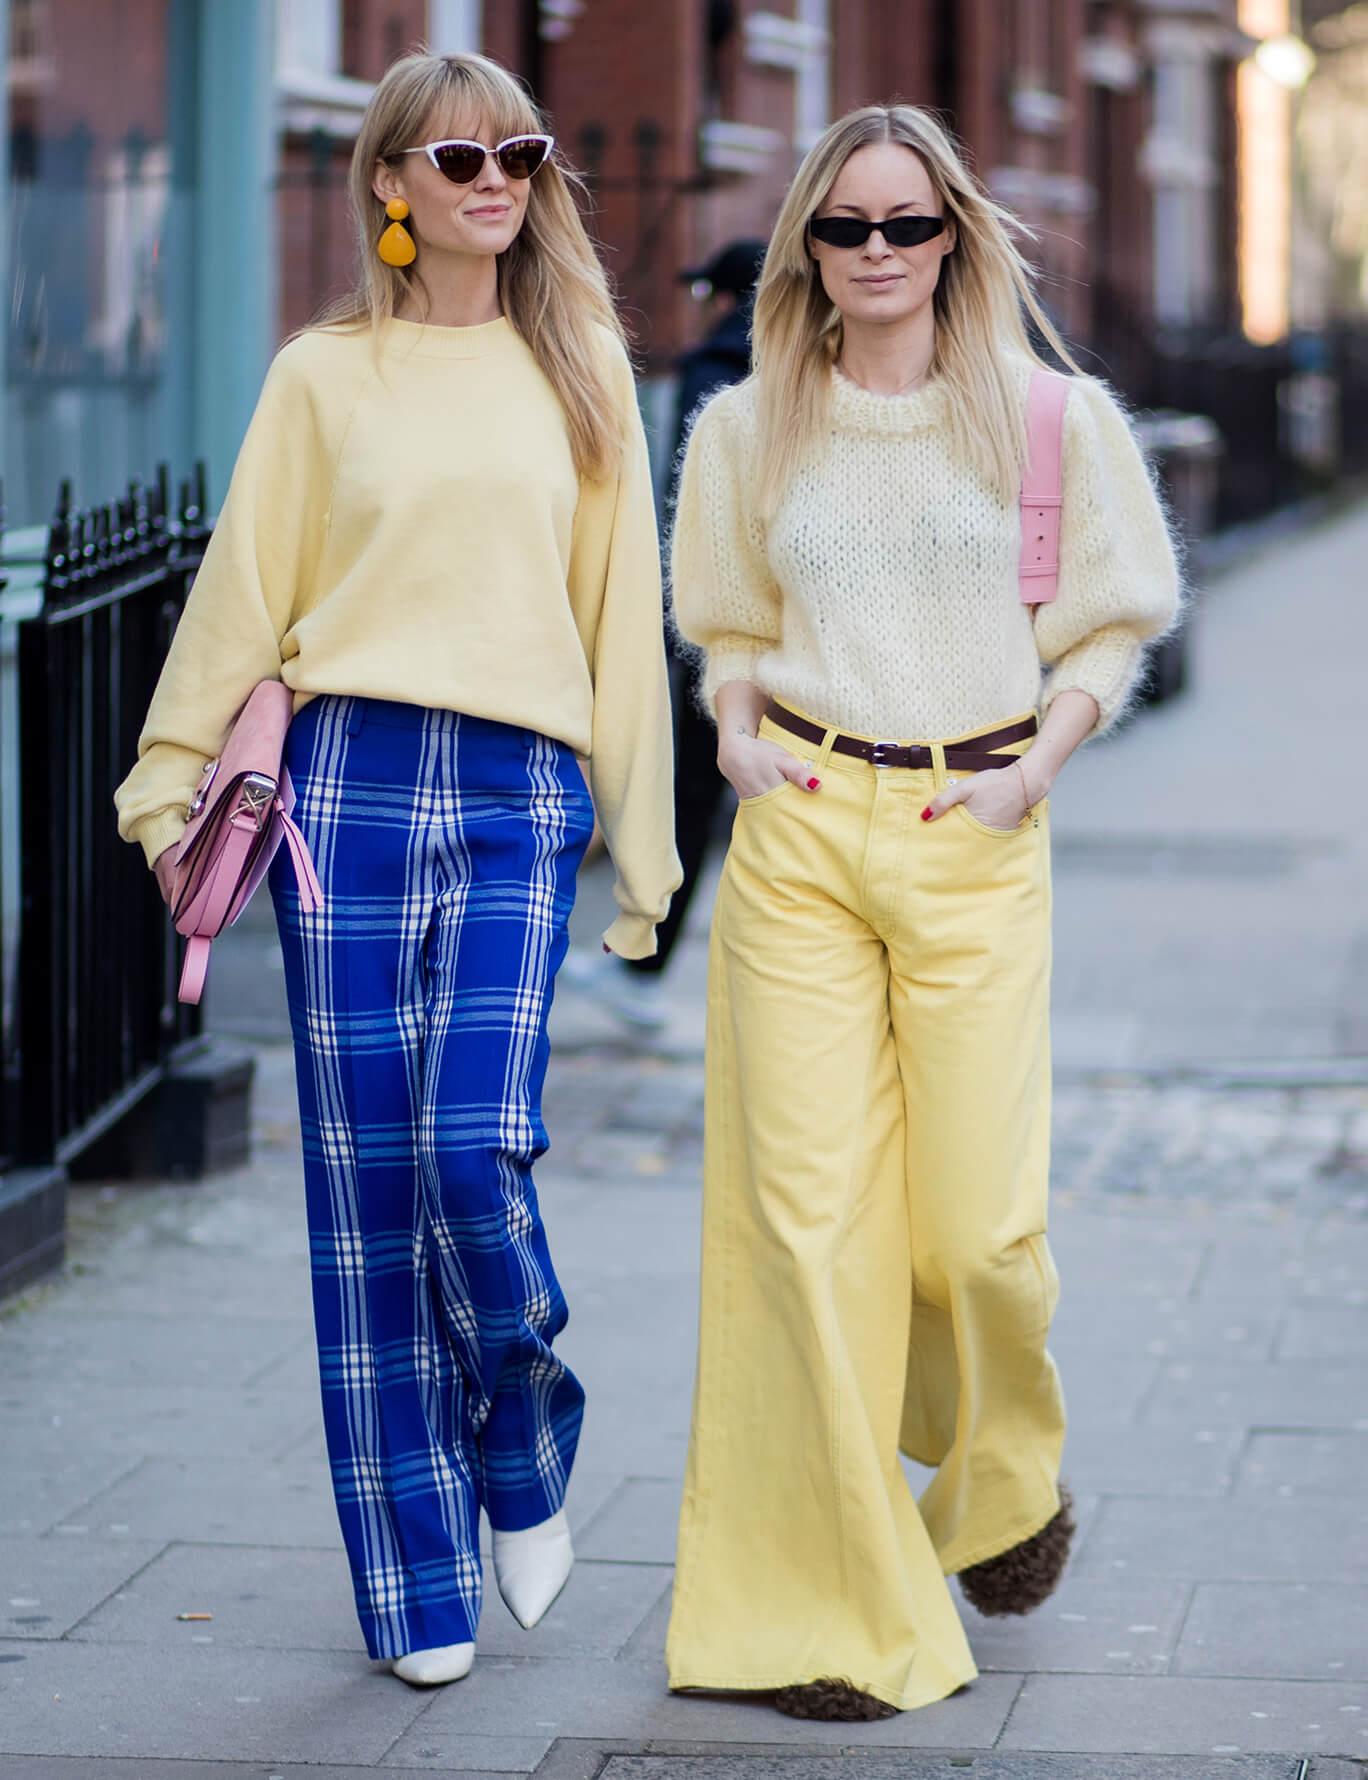 the-mod-the-modist-modest-fashion-street-style-london-1-1